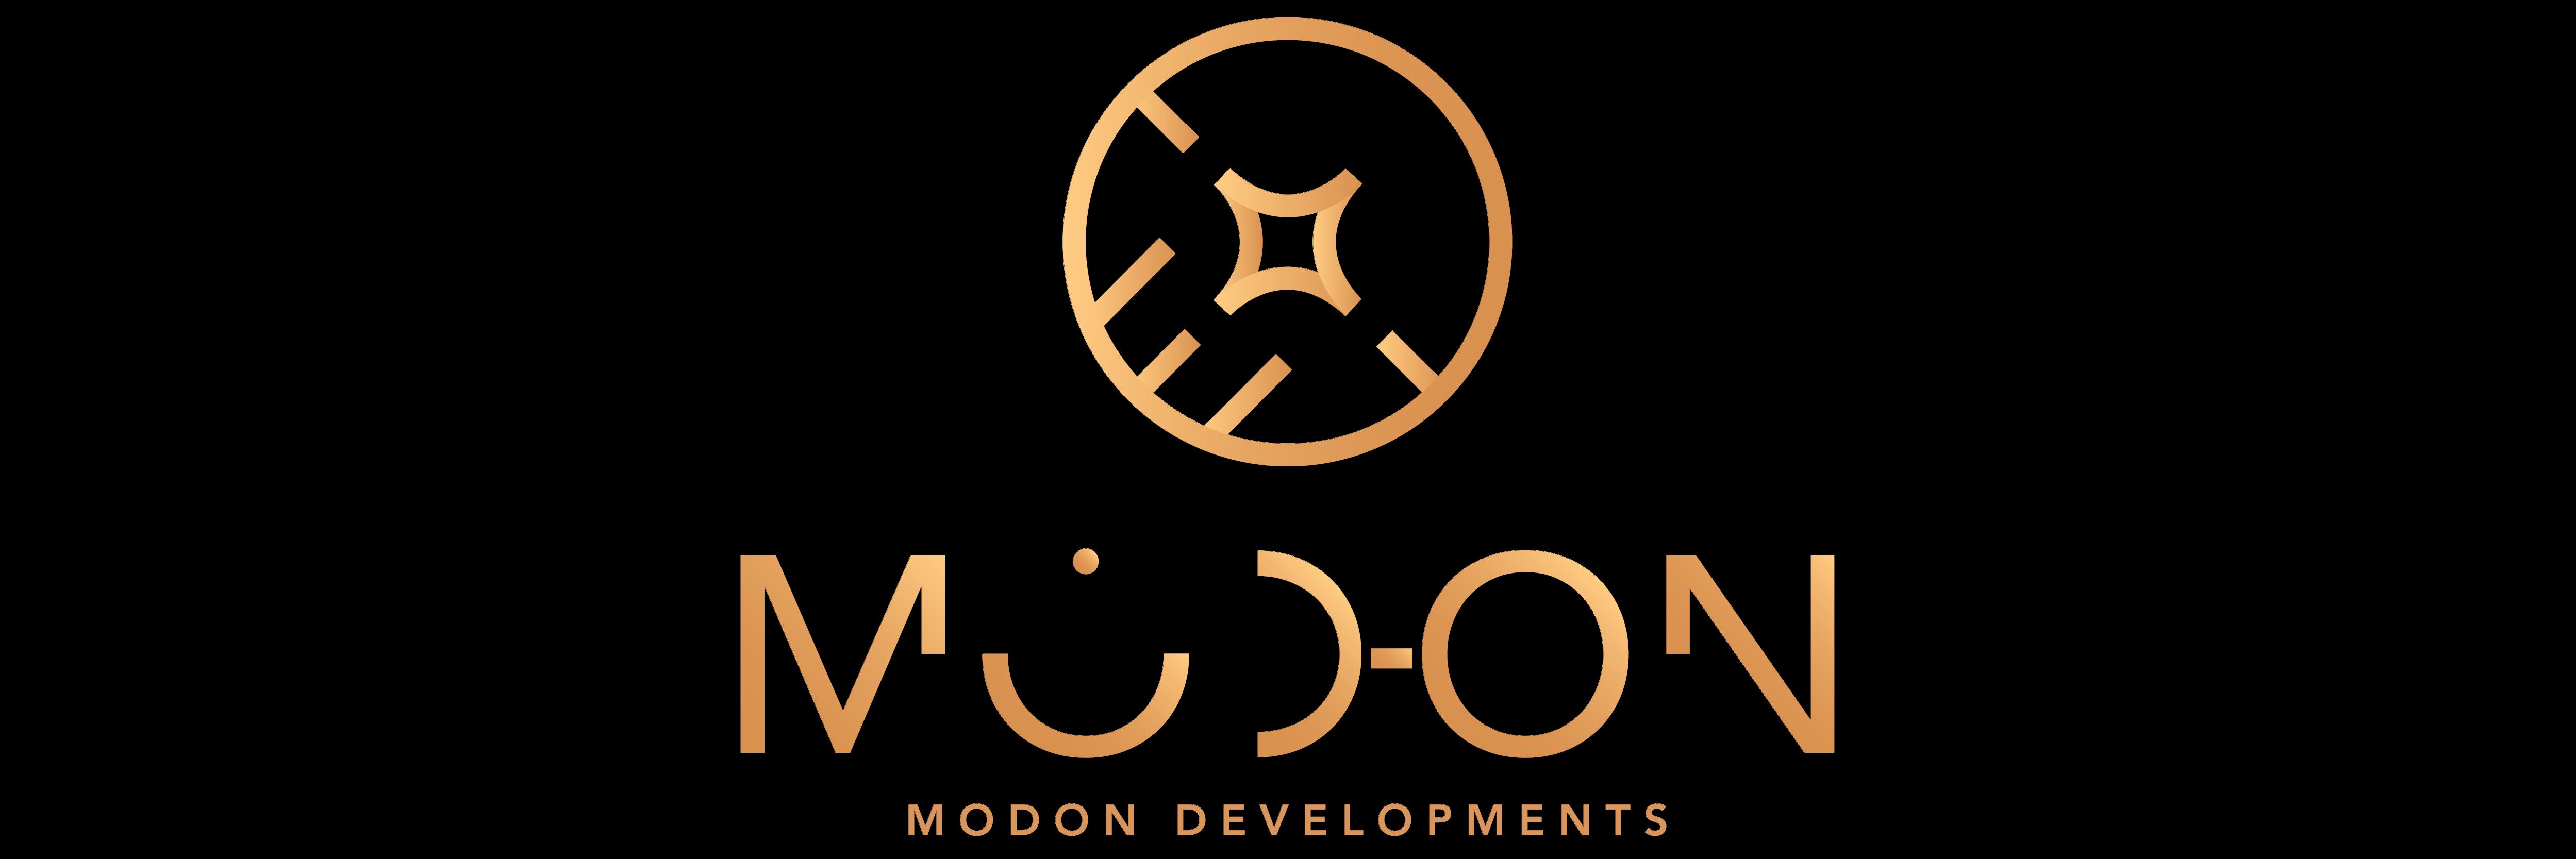 Modon Developments